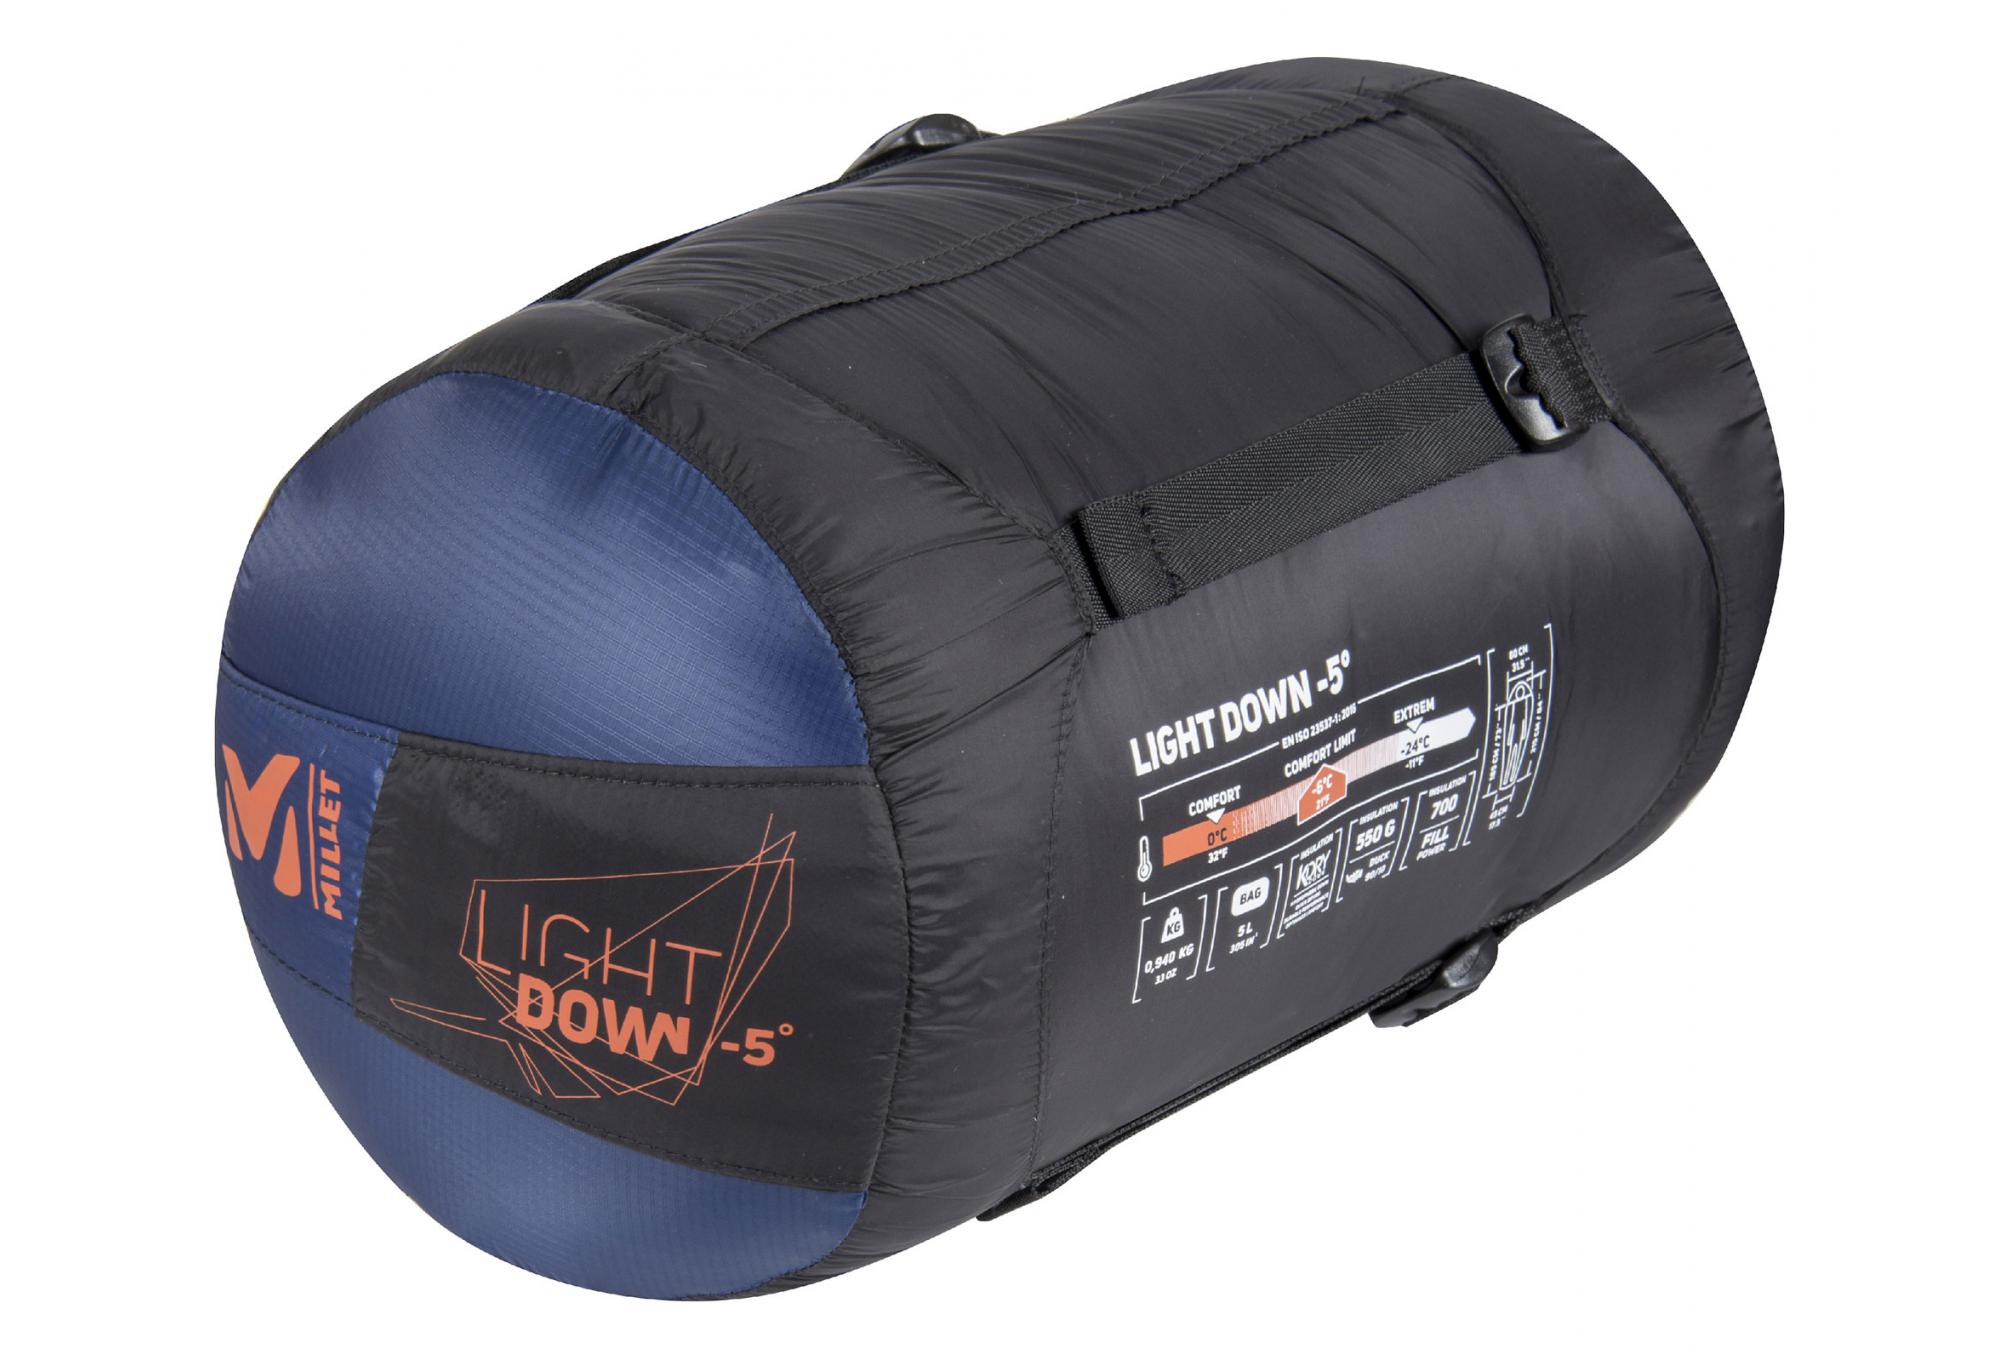 Millet Light Down 5 Sleeping Bag Blue